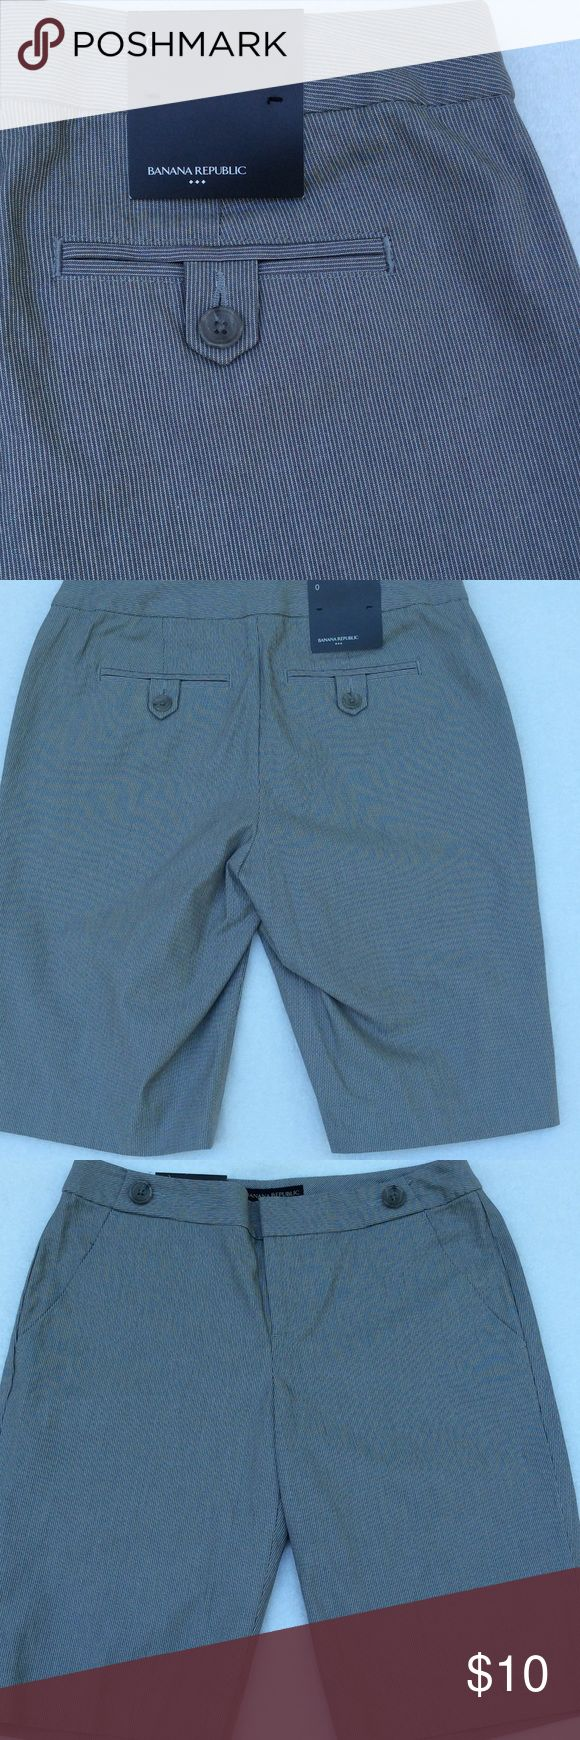 BANANA REPUBLIC GRAY SHORTS Banana Republic Gray Pinstriped Shorts ➖ 97 % Cotton 3% Spandex Banana Republic Shorts Bermudas